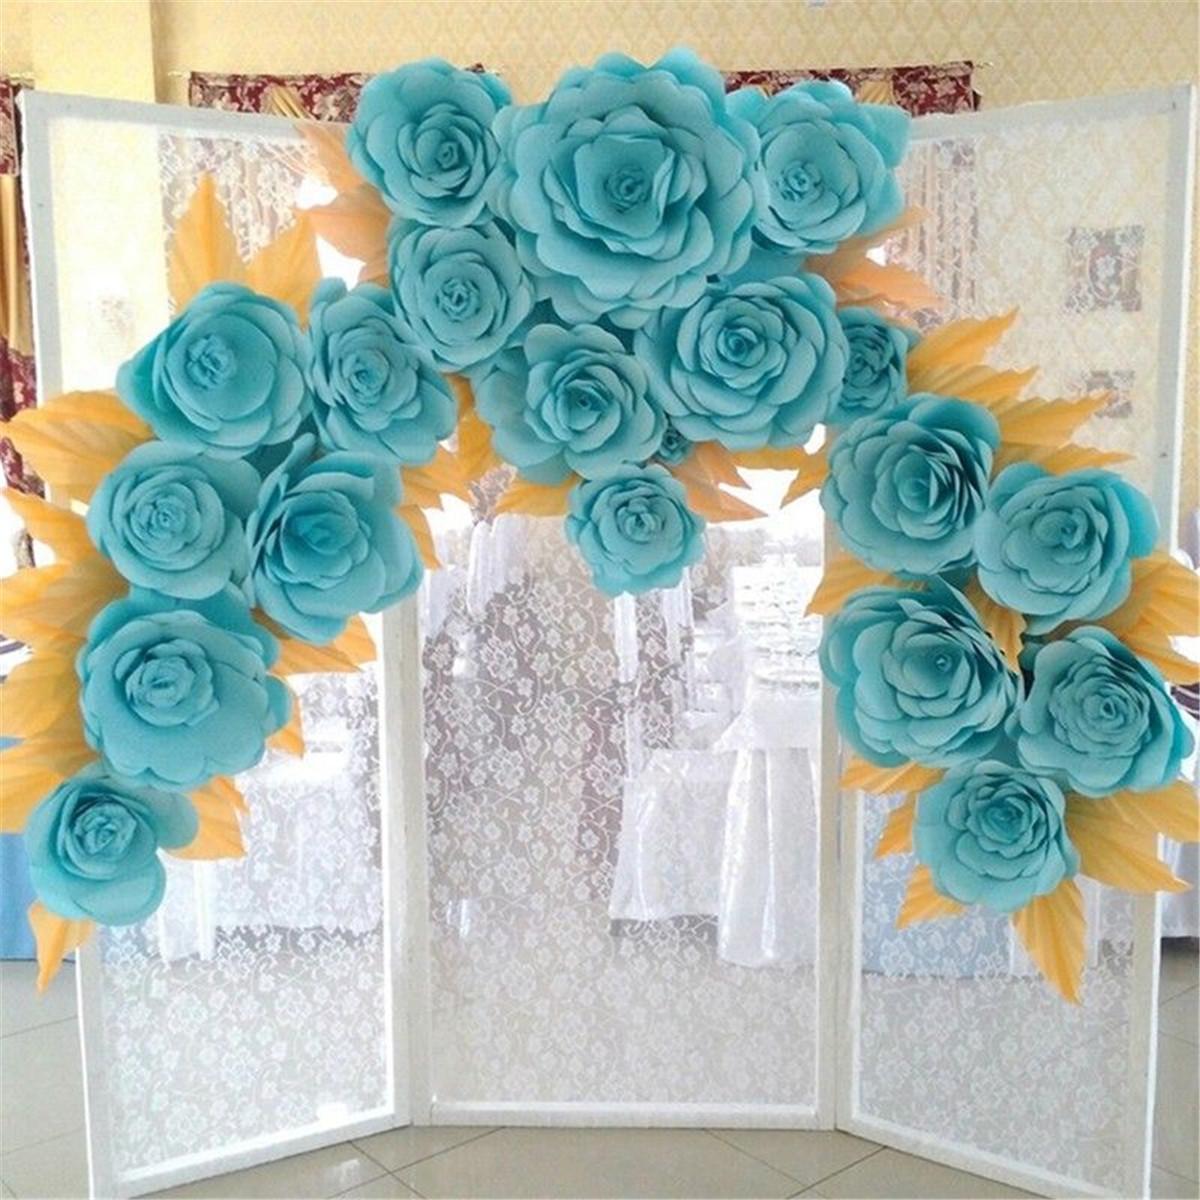 30cm Handmade Paper Flower Diy Backdrop Wall Wedding Birthday Party